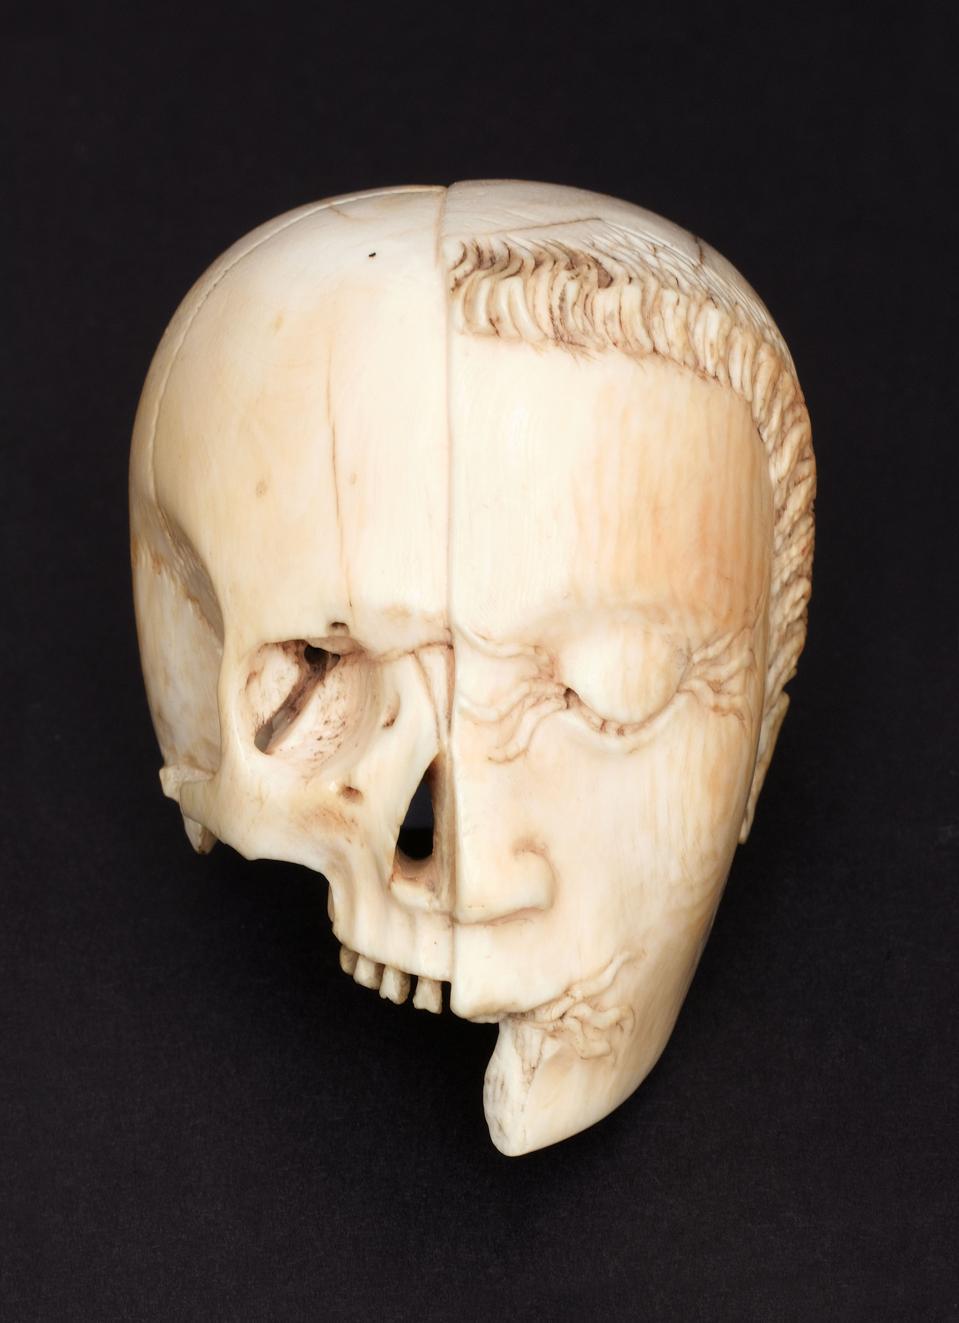 Ivory memento mori. Europe, 1601-1900.